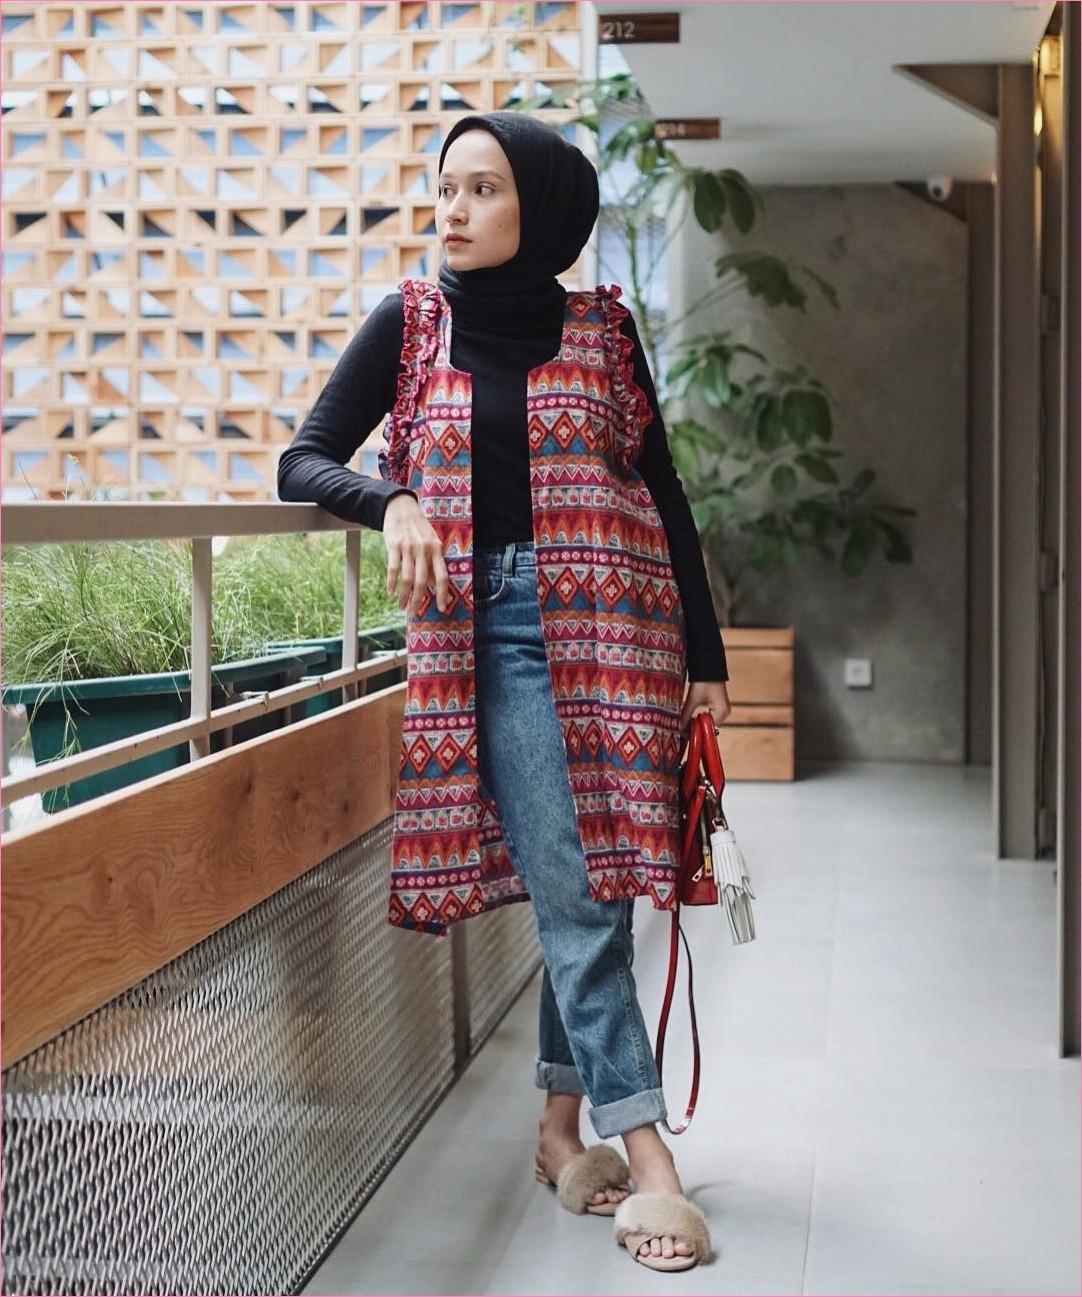 Outfit Celana Jeans Untuk Hijabers Ala Selebgram 2018 mangset kerudung segiempat hijab square hitam outer slingbags merah tua pants jeans denim sandals loafers and slip ons krem ootd trendy